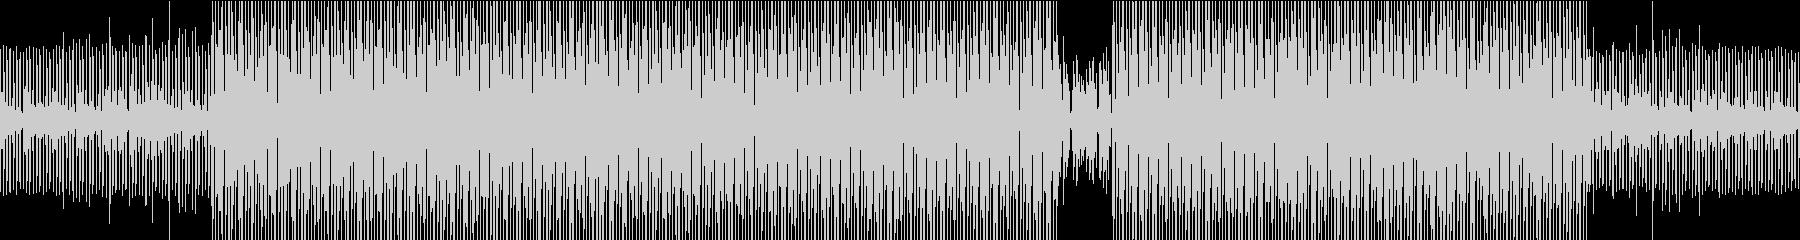 EDM-エレクトロ。深夜のセクシー...の未再生の波形